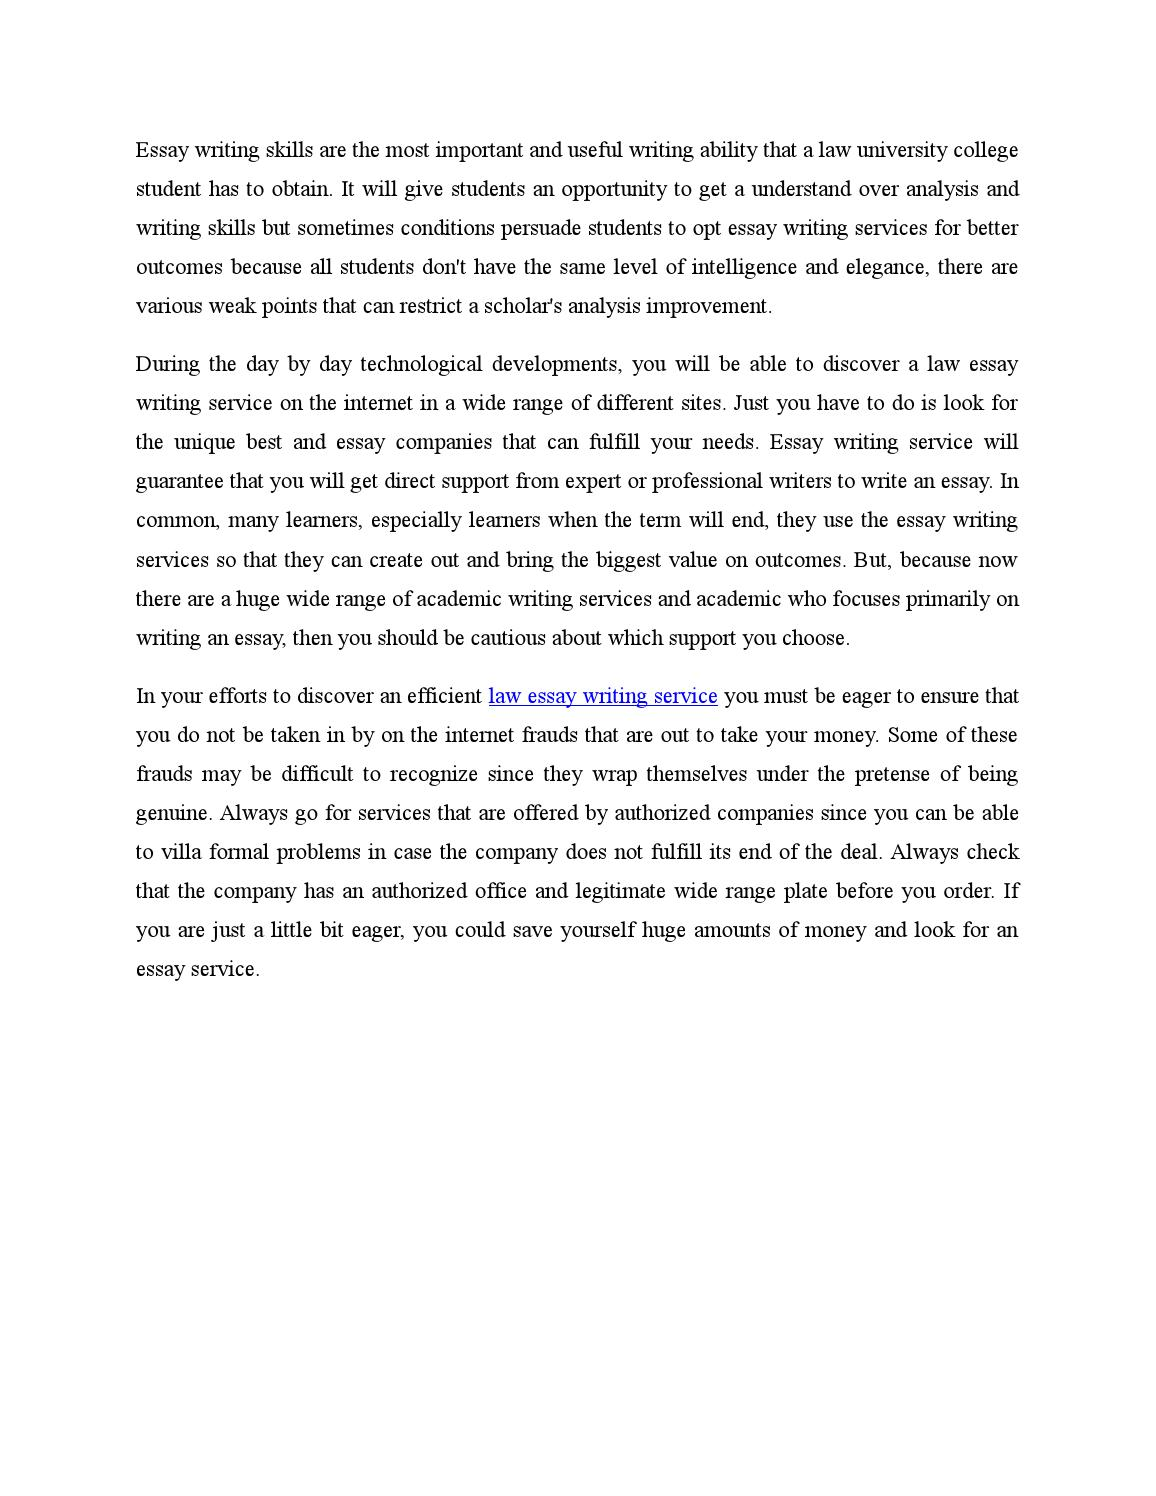 disadvantages of technology essay